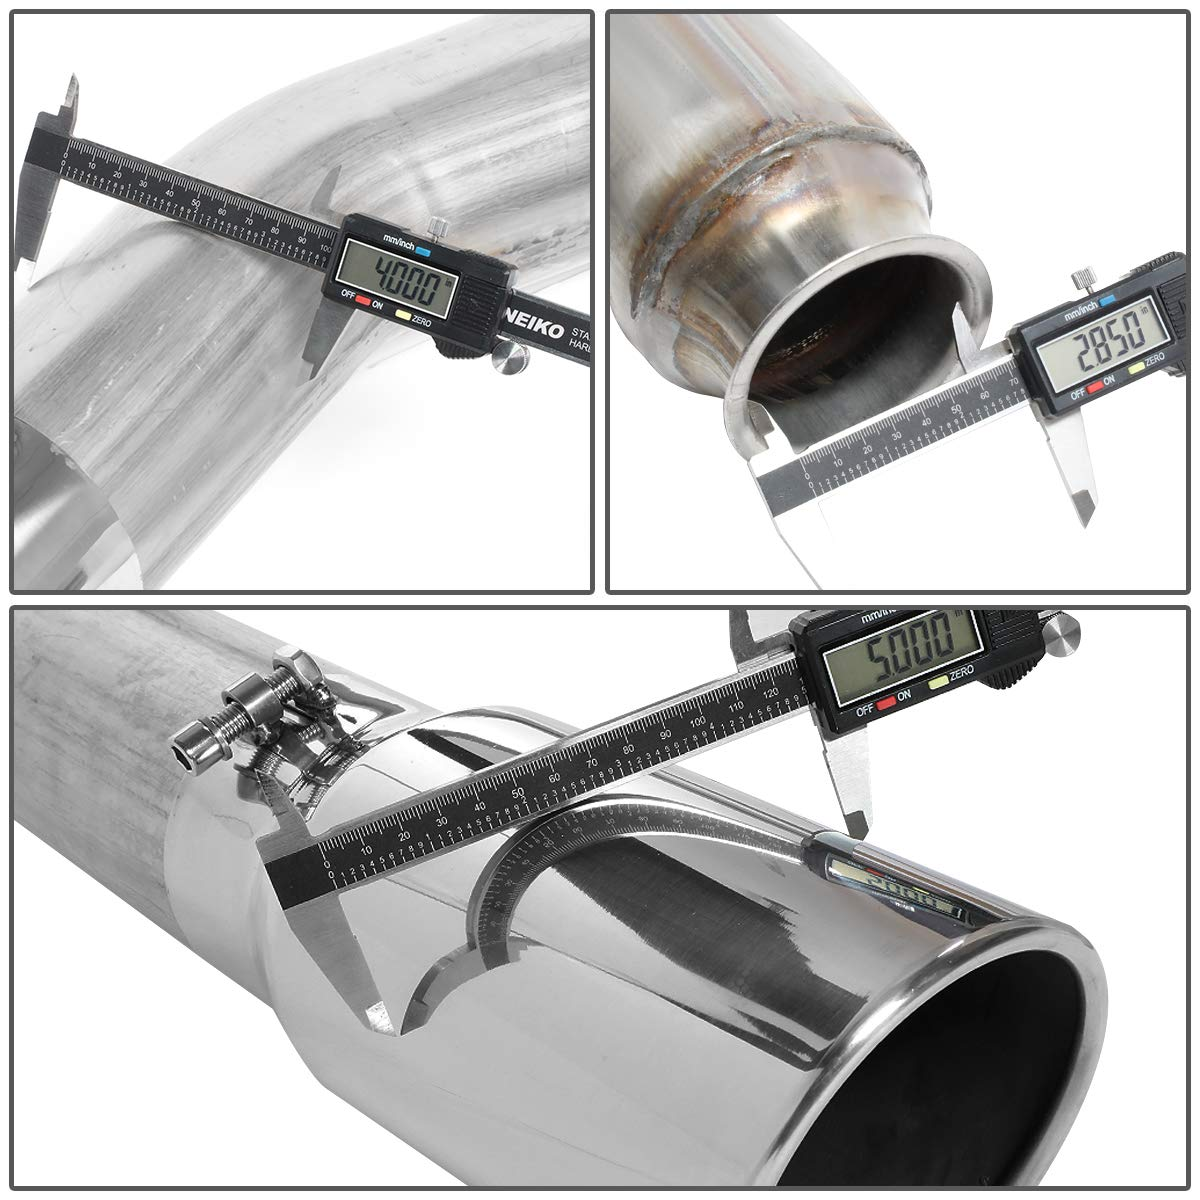 DNA Motoring CBE-GMC25-002 4 Muffler+5 OD Tip Down Pipe Catback Exhasut Kit